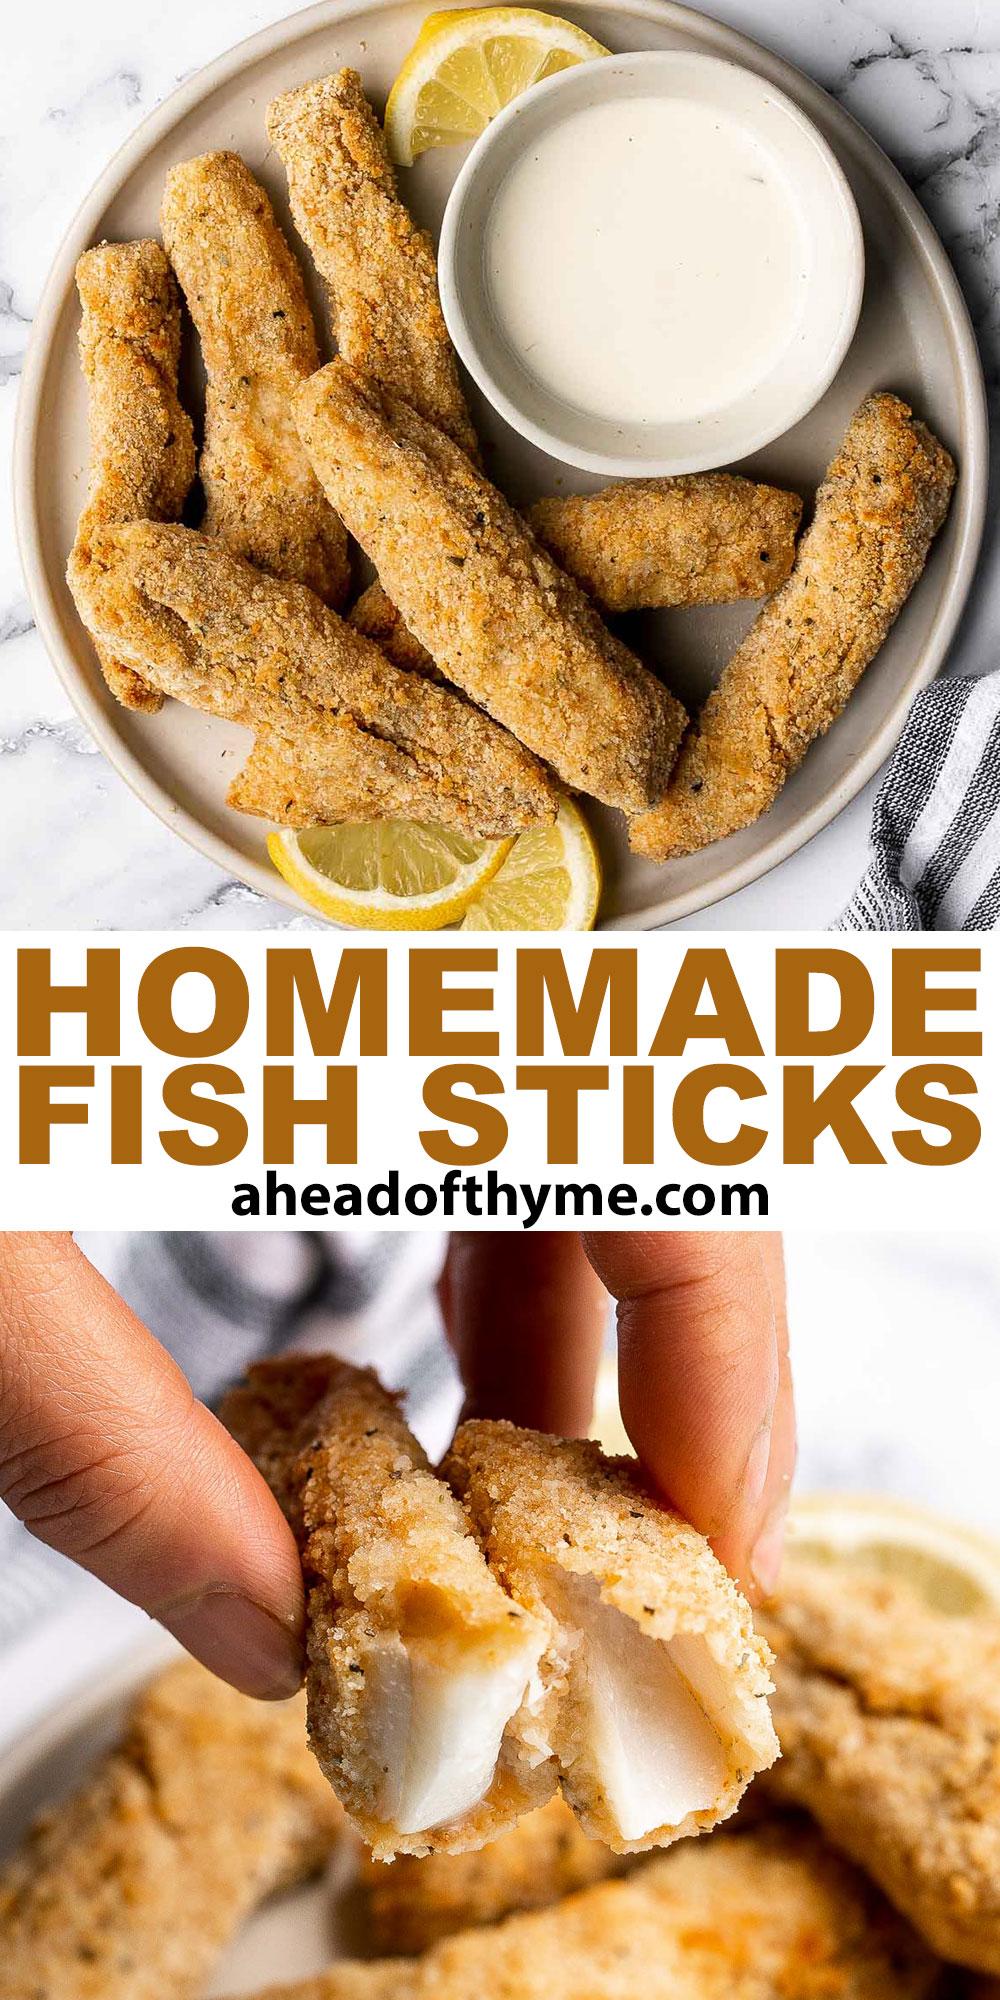 Homemade Fish Sticks